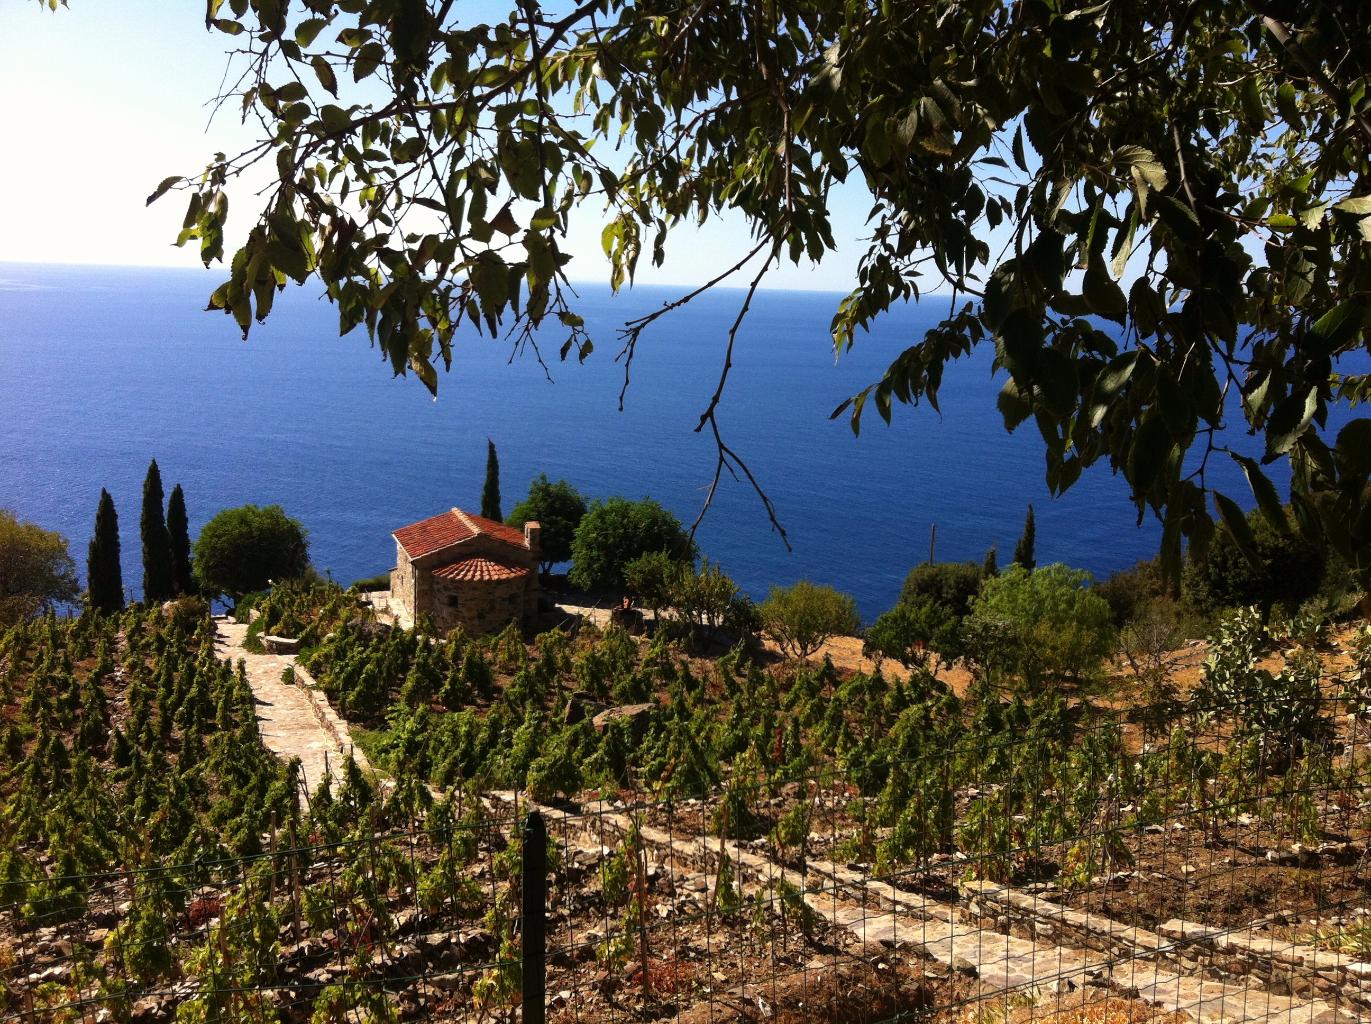 Guida Isola d'elba - degustazione vini